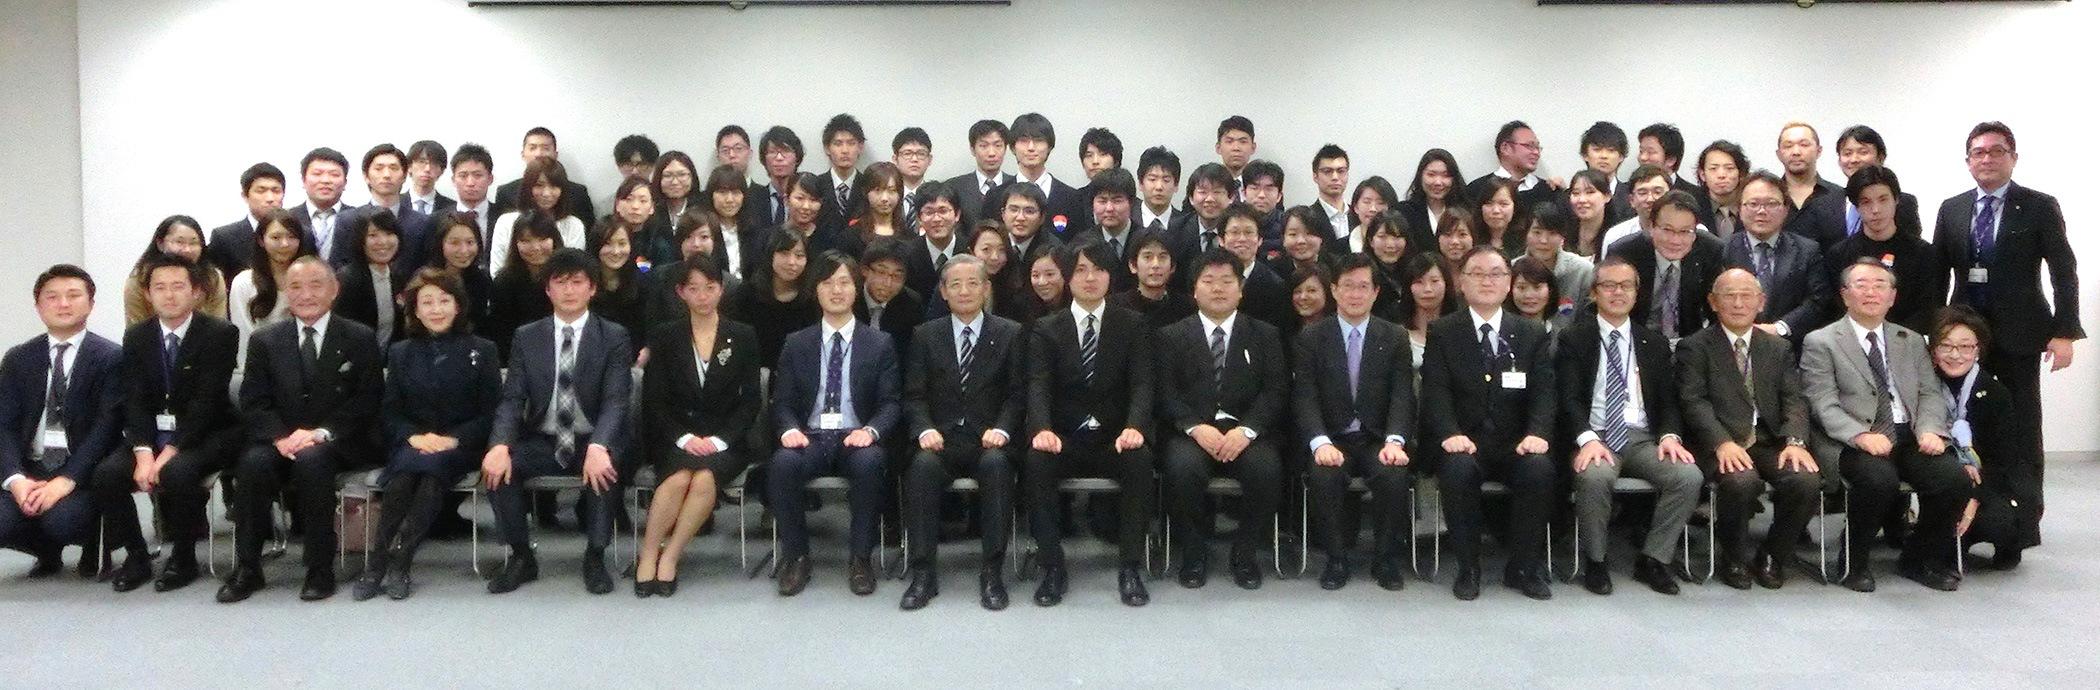 shinshin_meeting_03_24